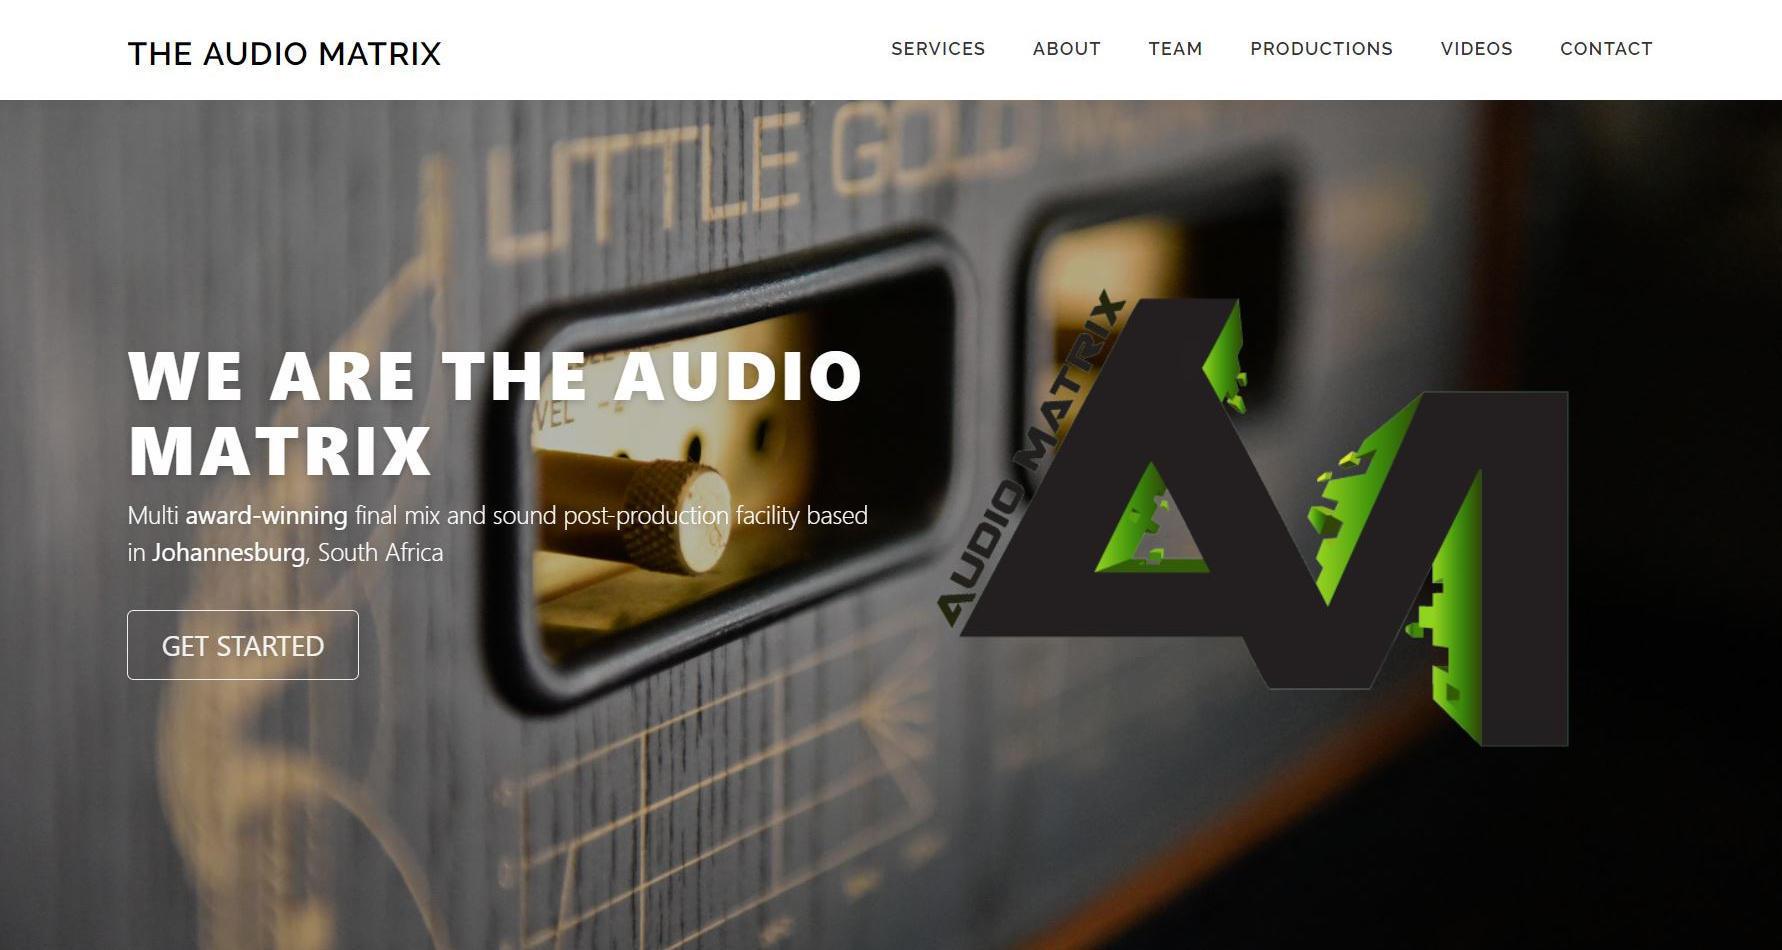 The Audio Matrix